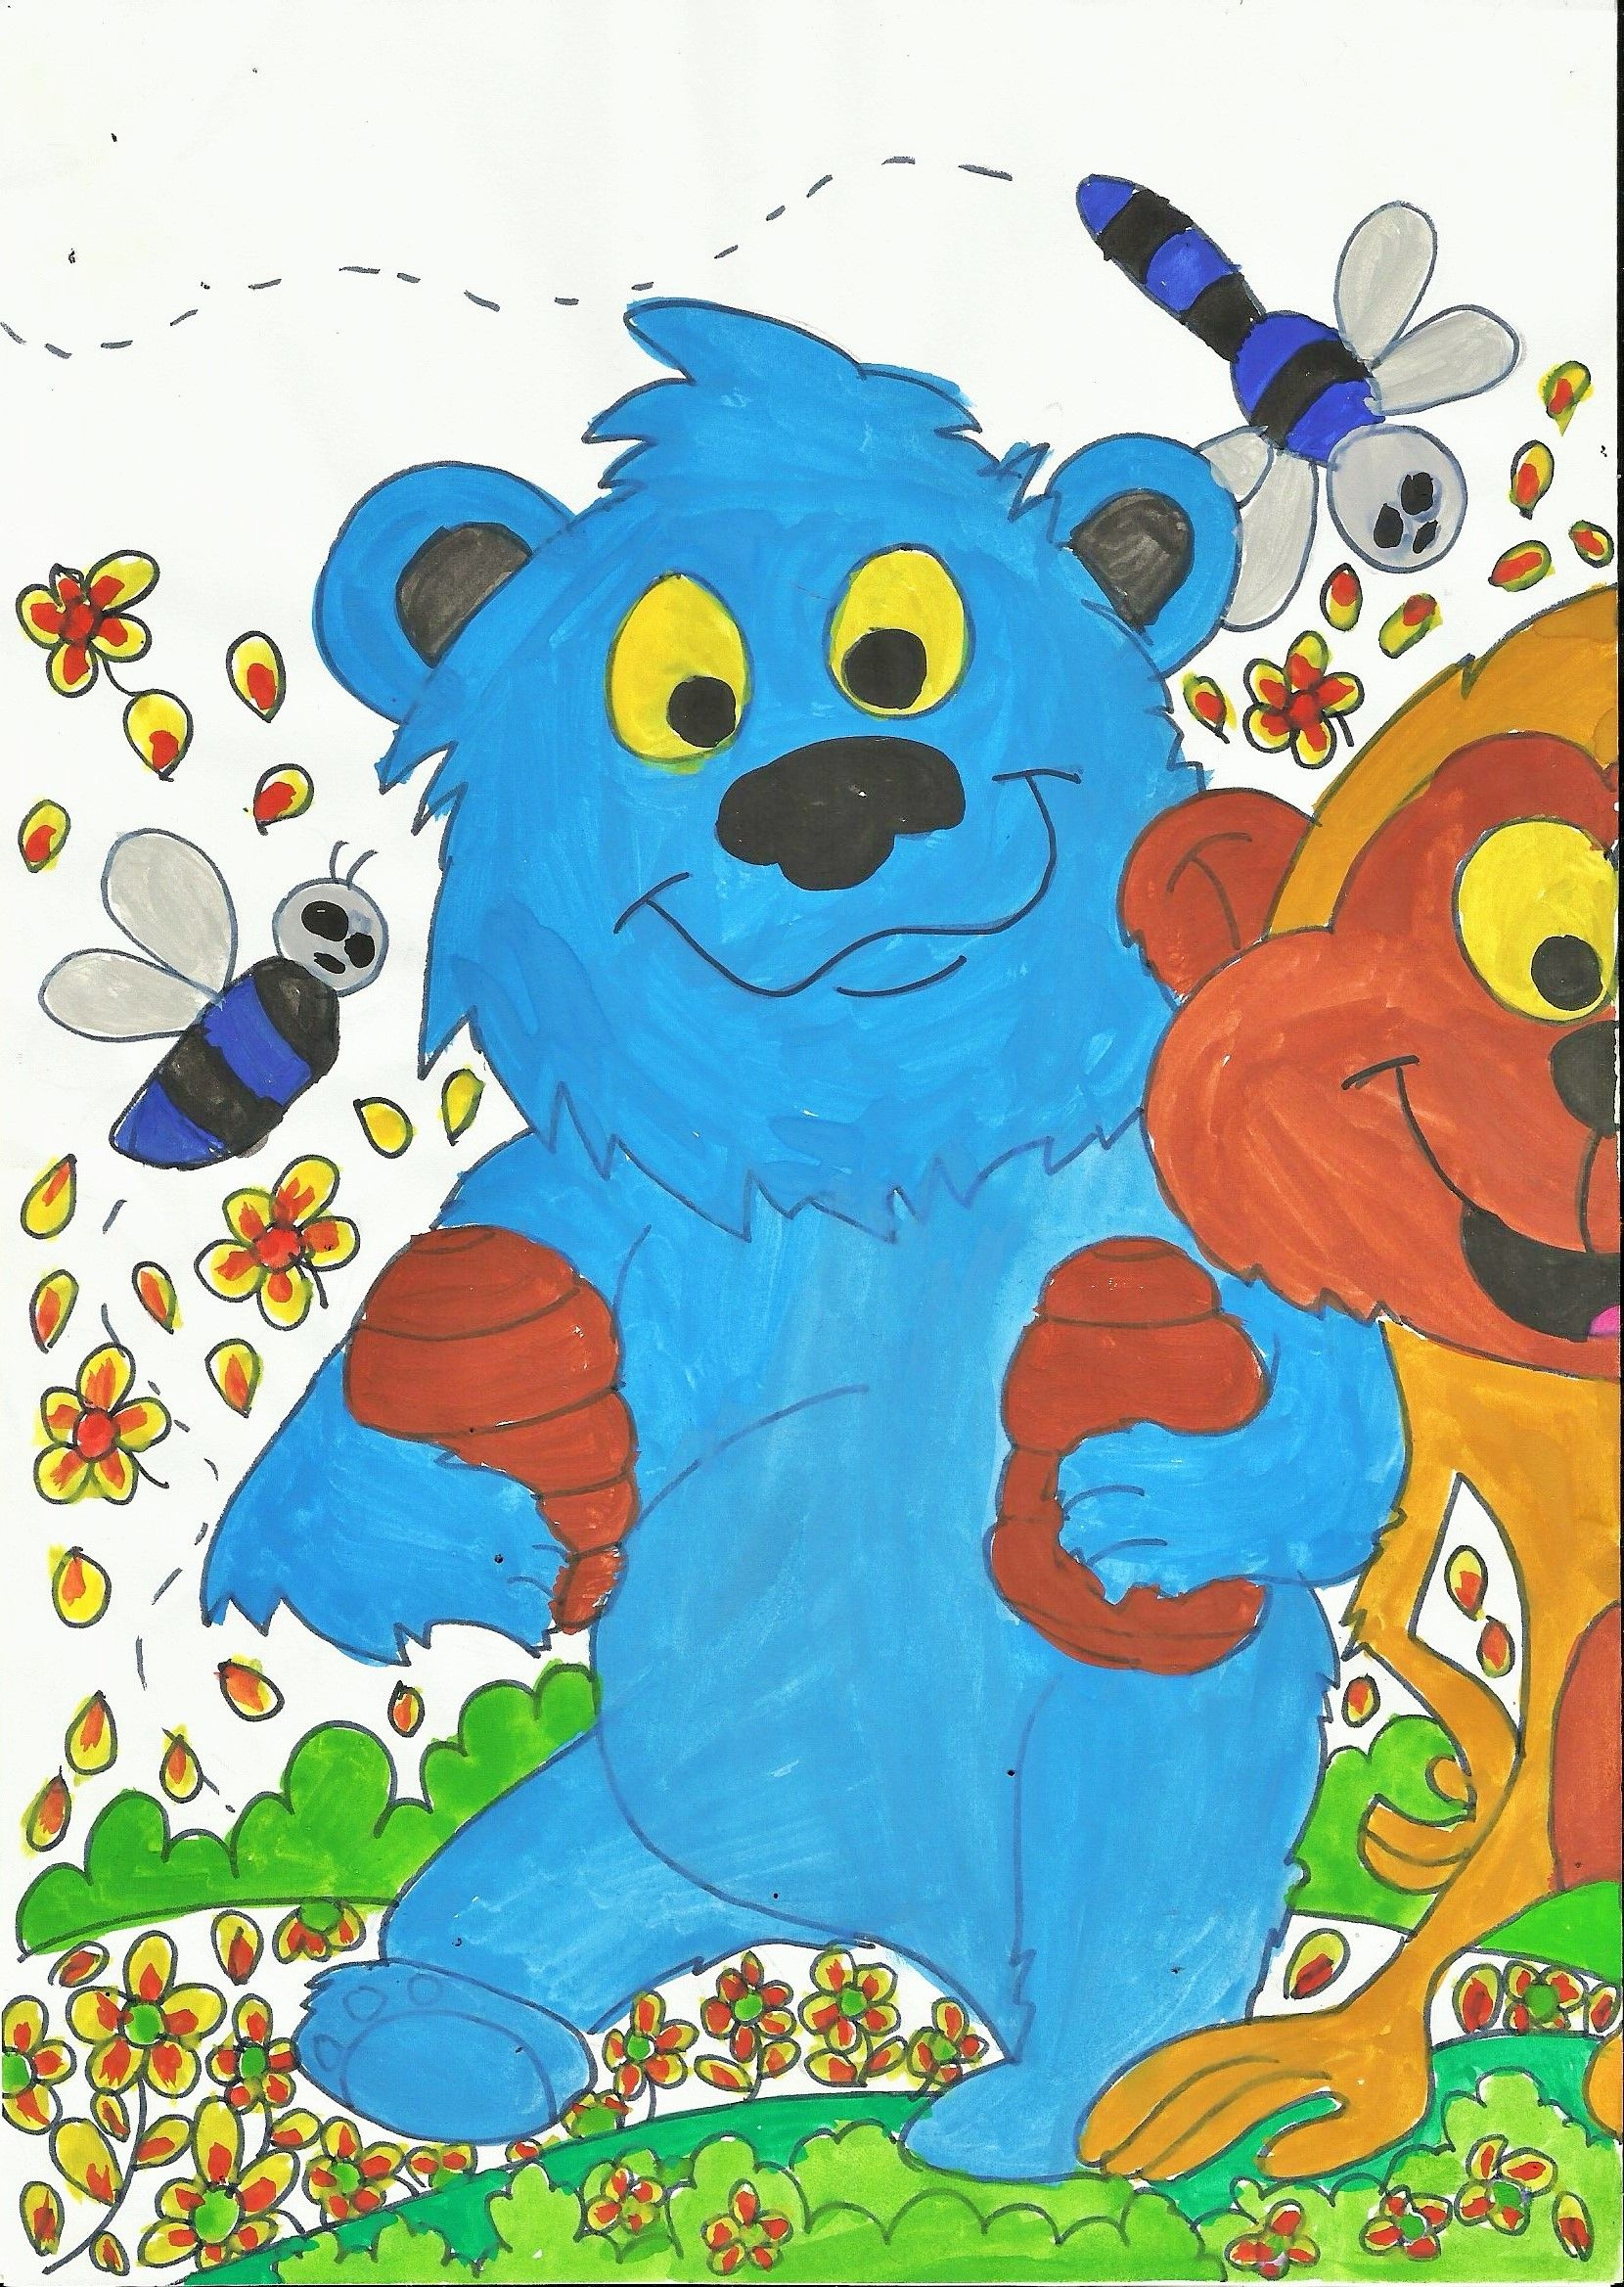 Pin Oleh Tesza Di Children Books Illustration